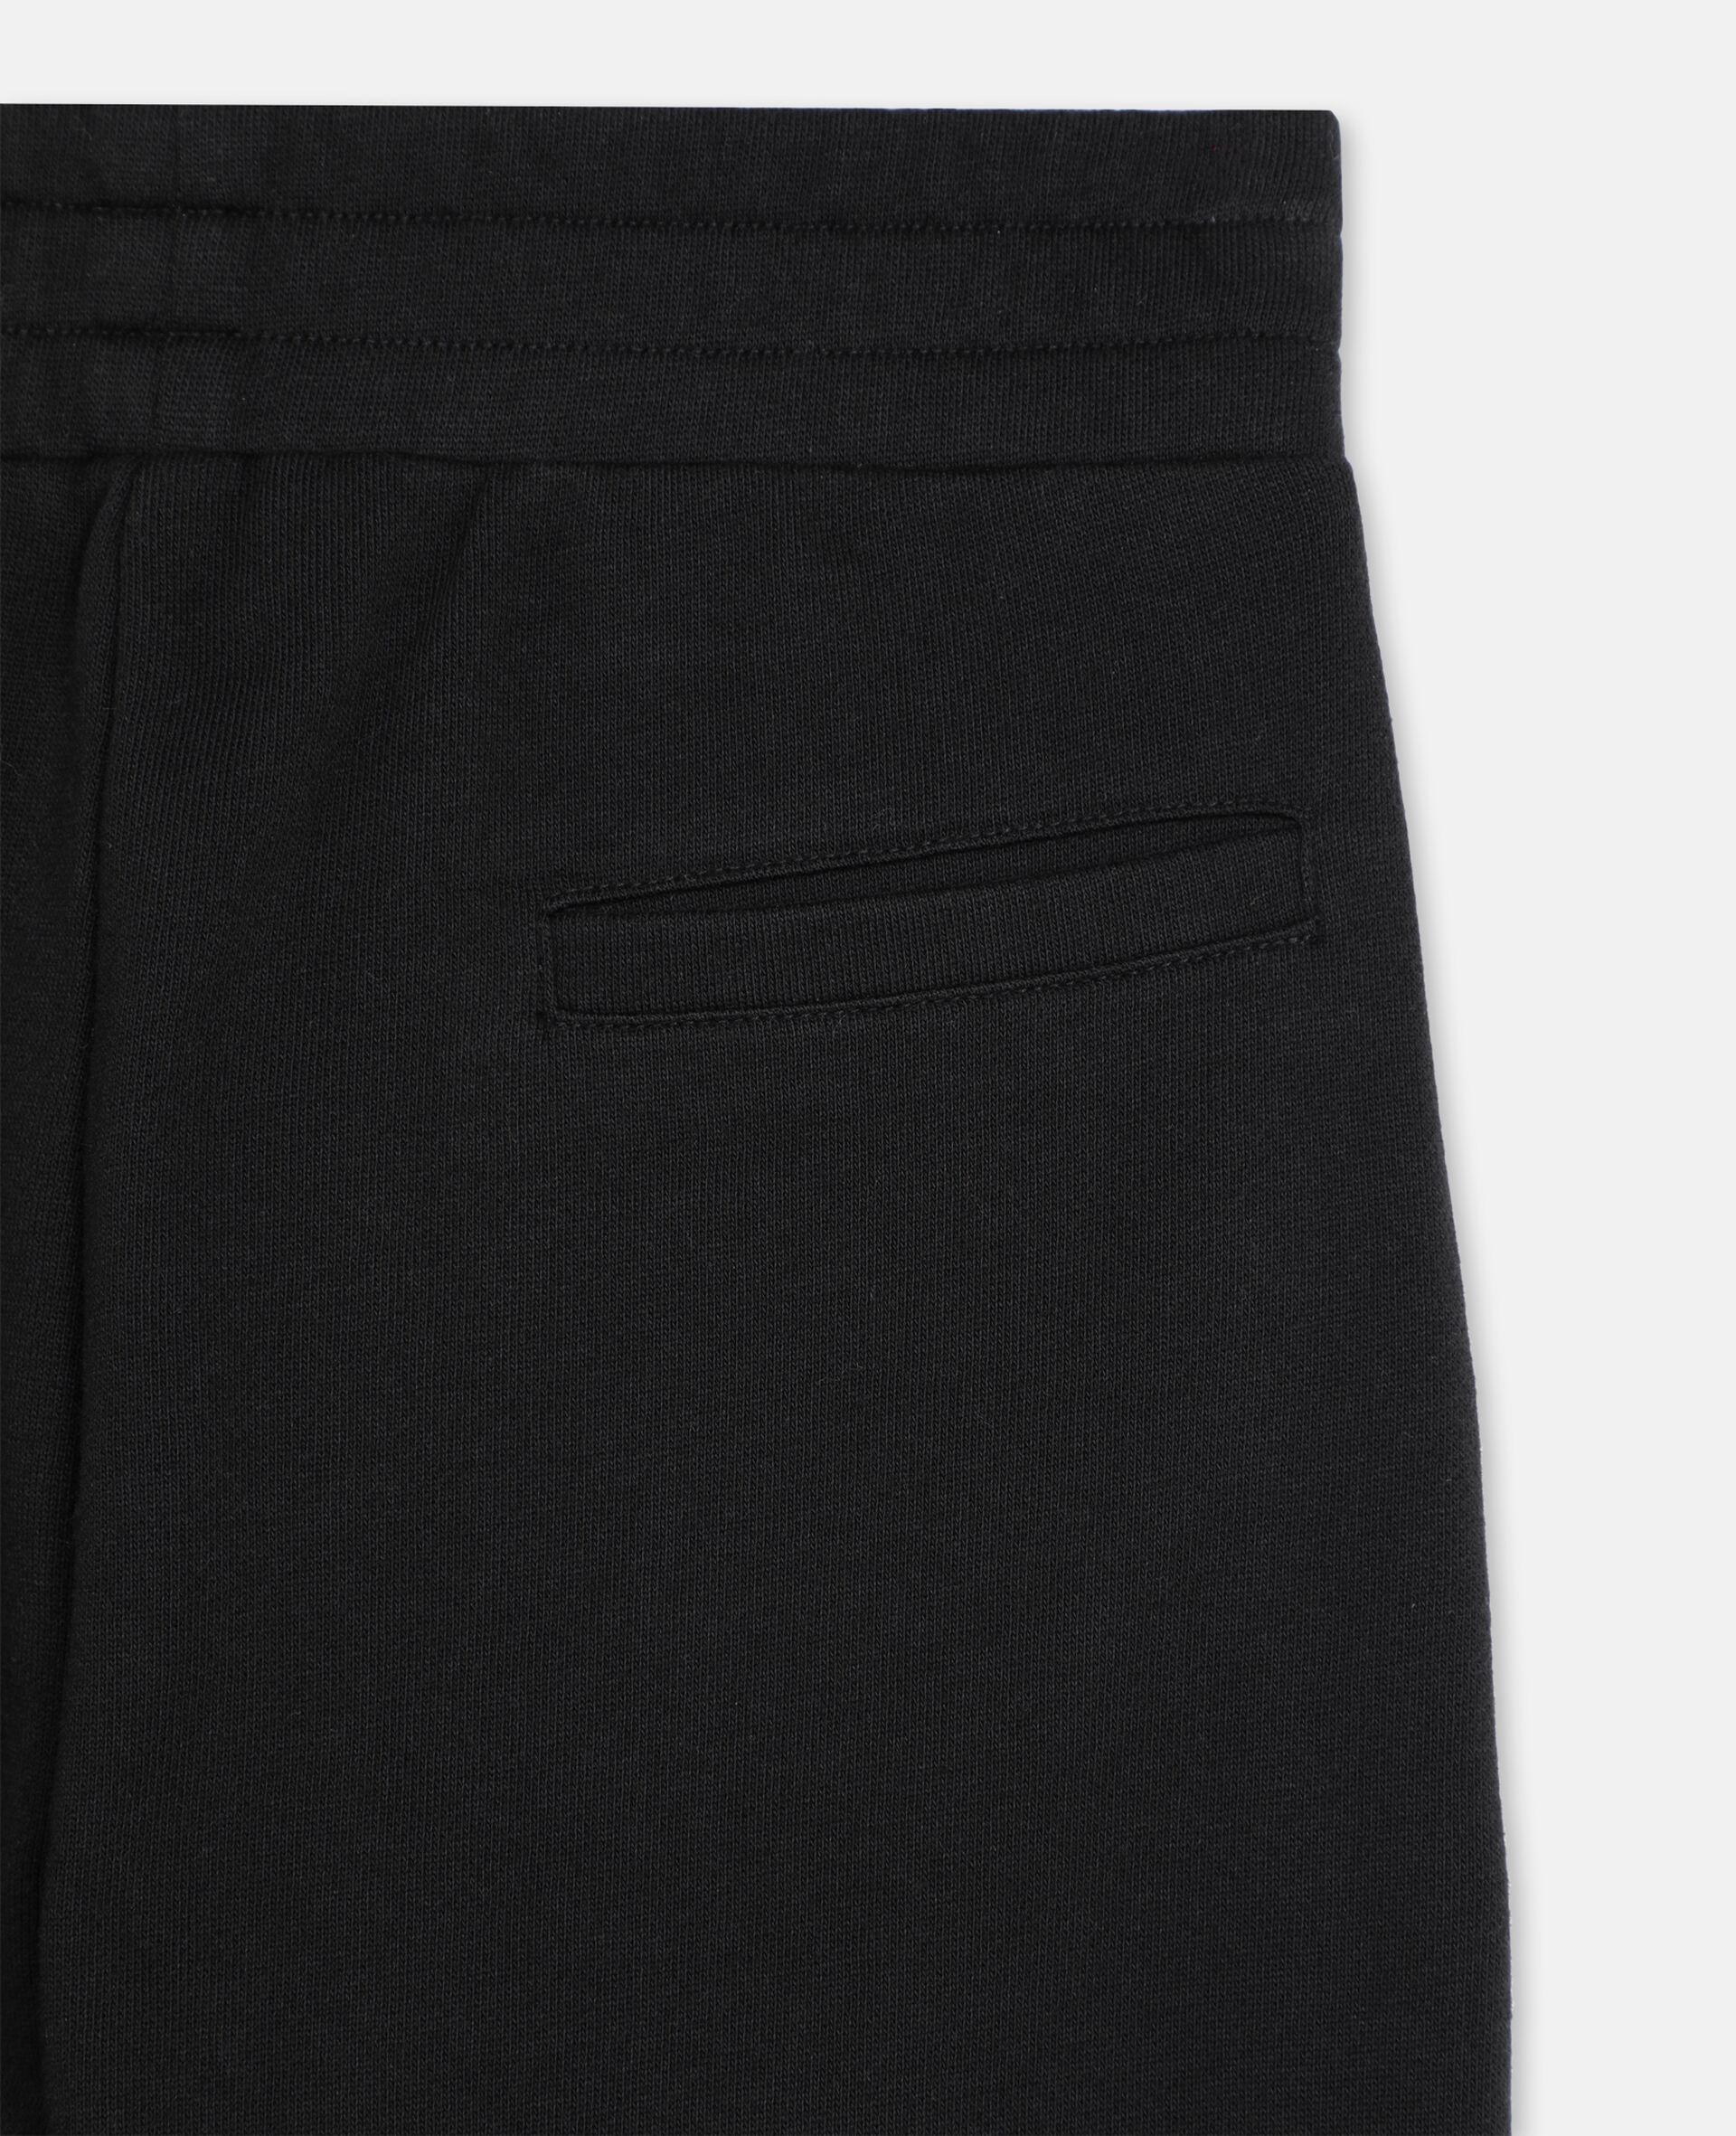 Basic 棉质运动裤 -黑色-large image number 2